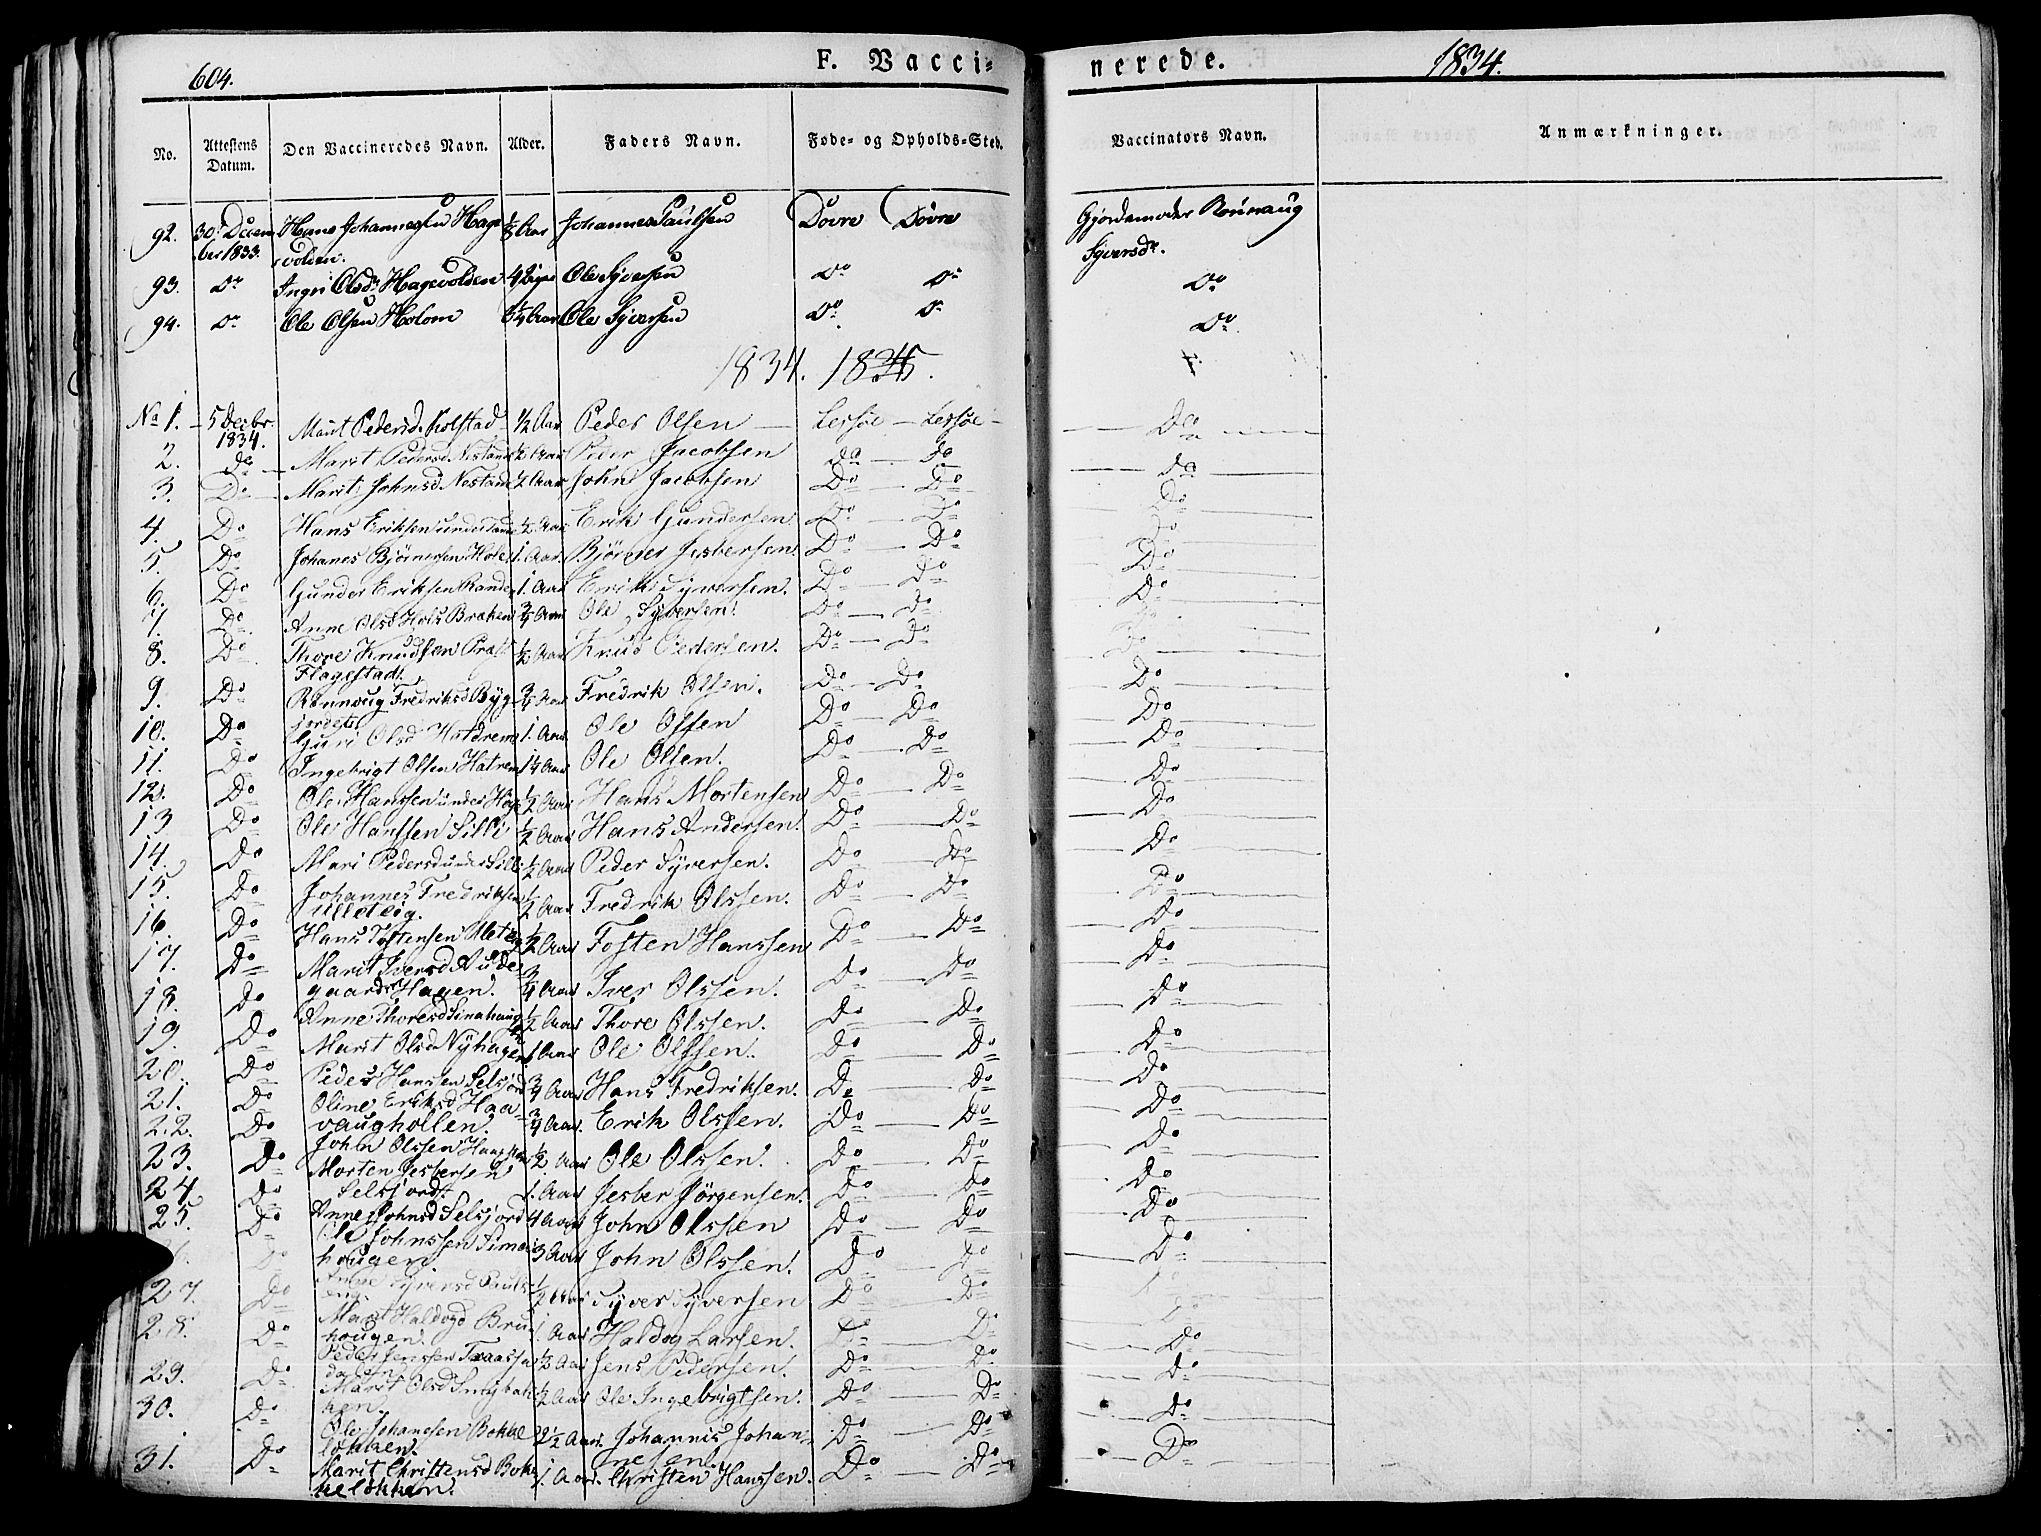 SAH, Lesja prestekontor, Ministerialbok nr. 5, 1830-1842, s. 604